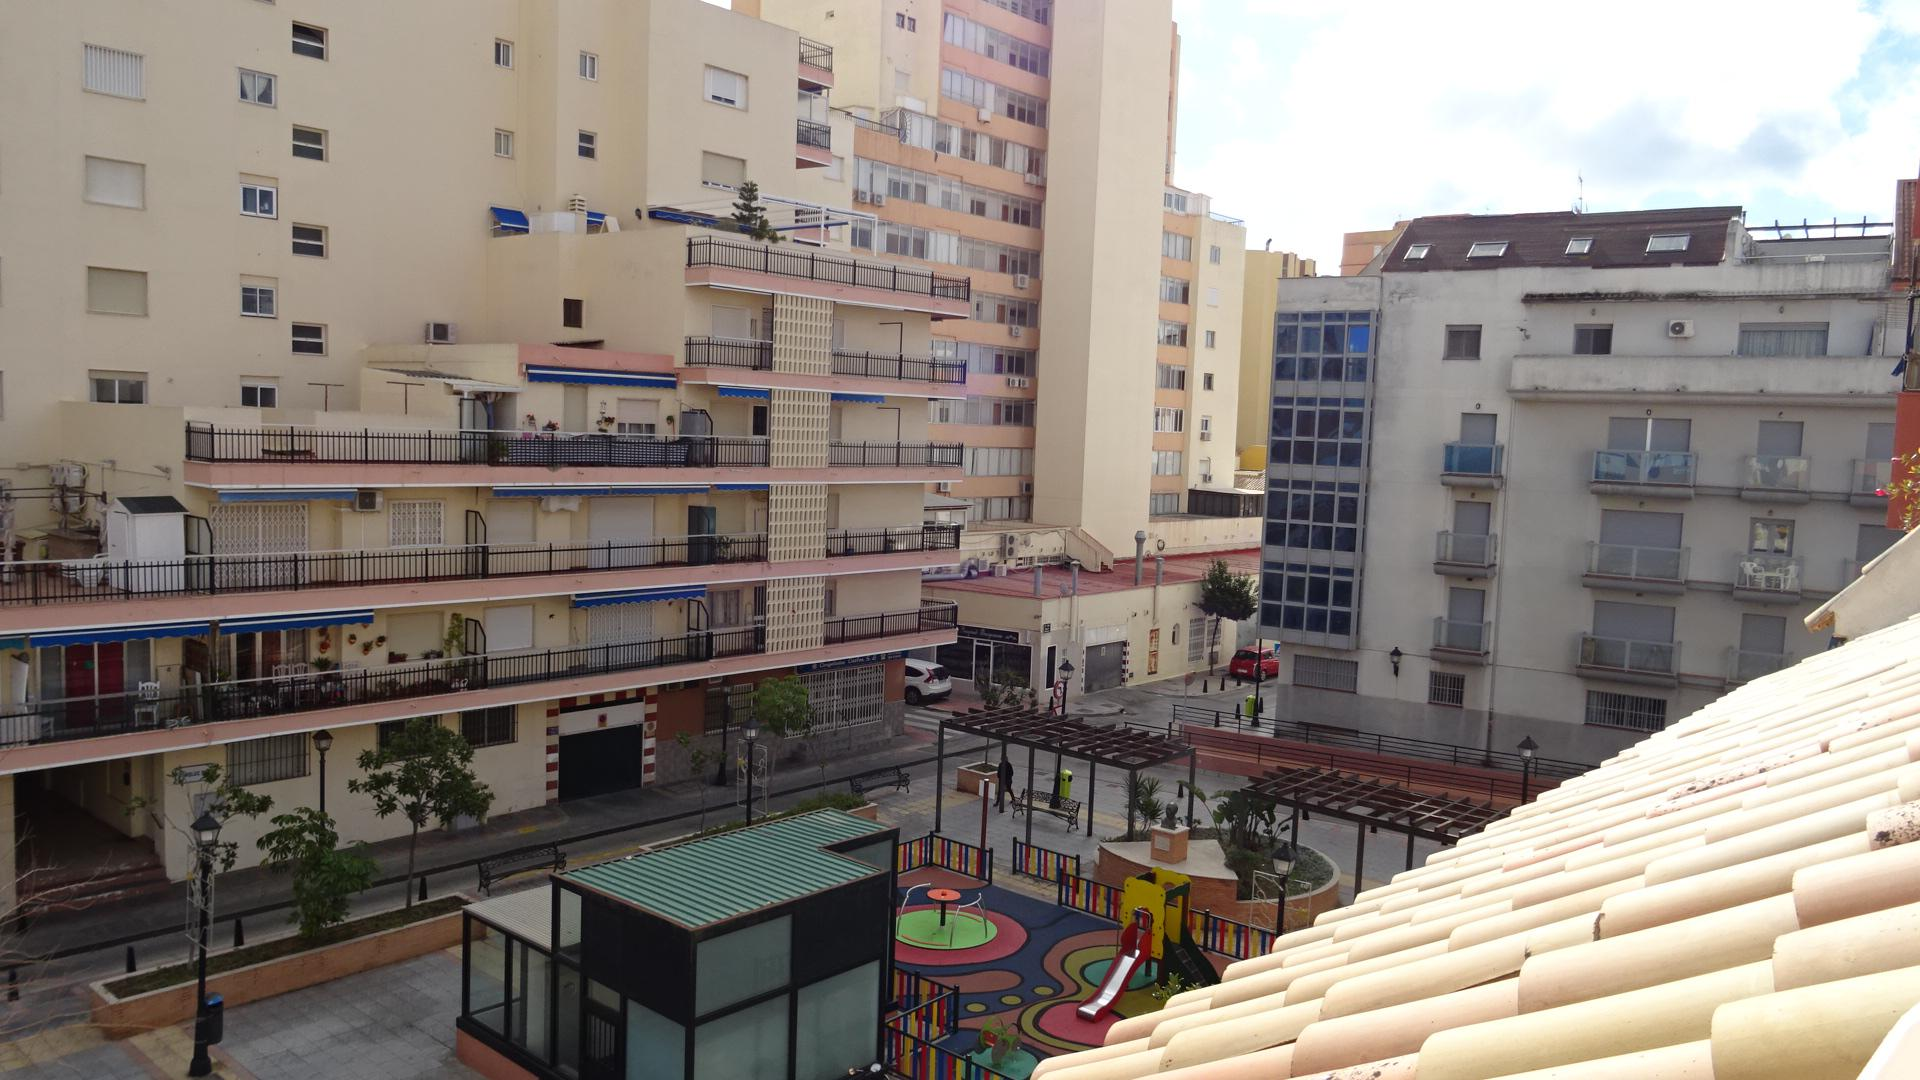 219424 - Plaza Picasso Fuengirola